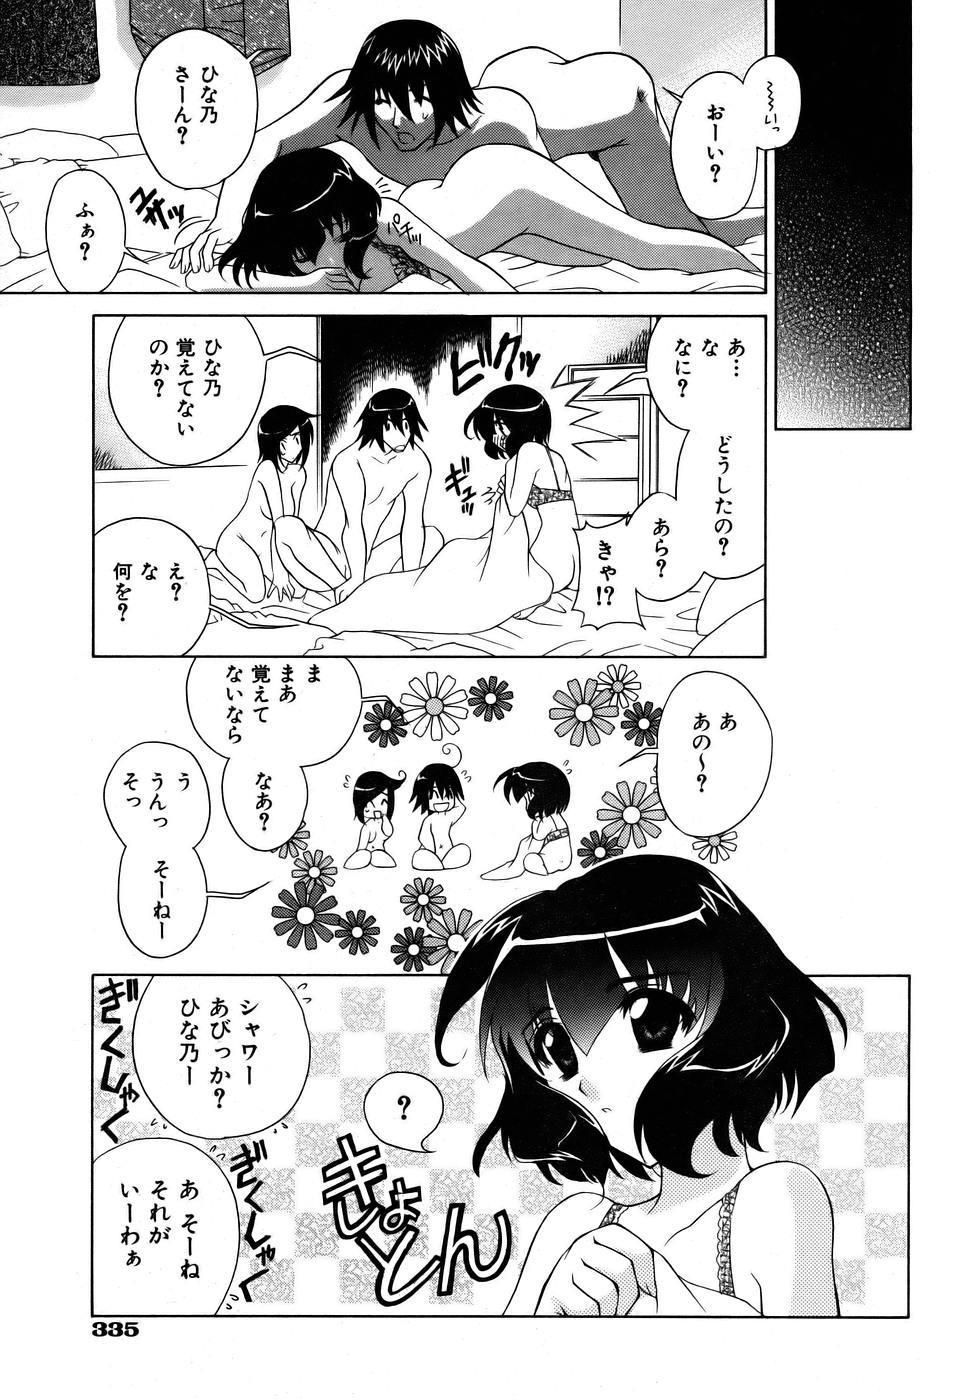 COMIC AUN 2005-12 Vol. 115 332